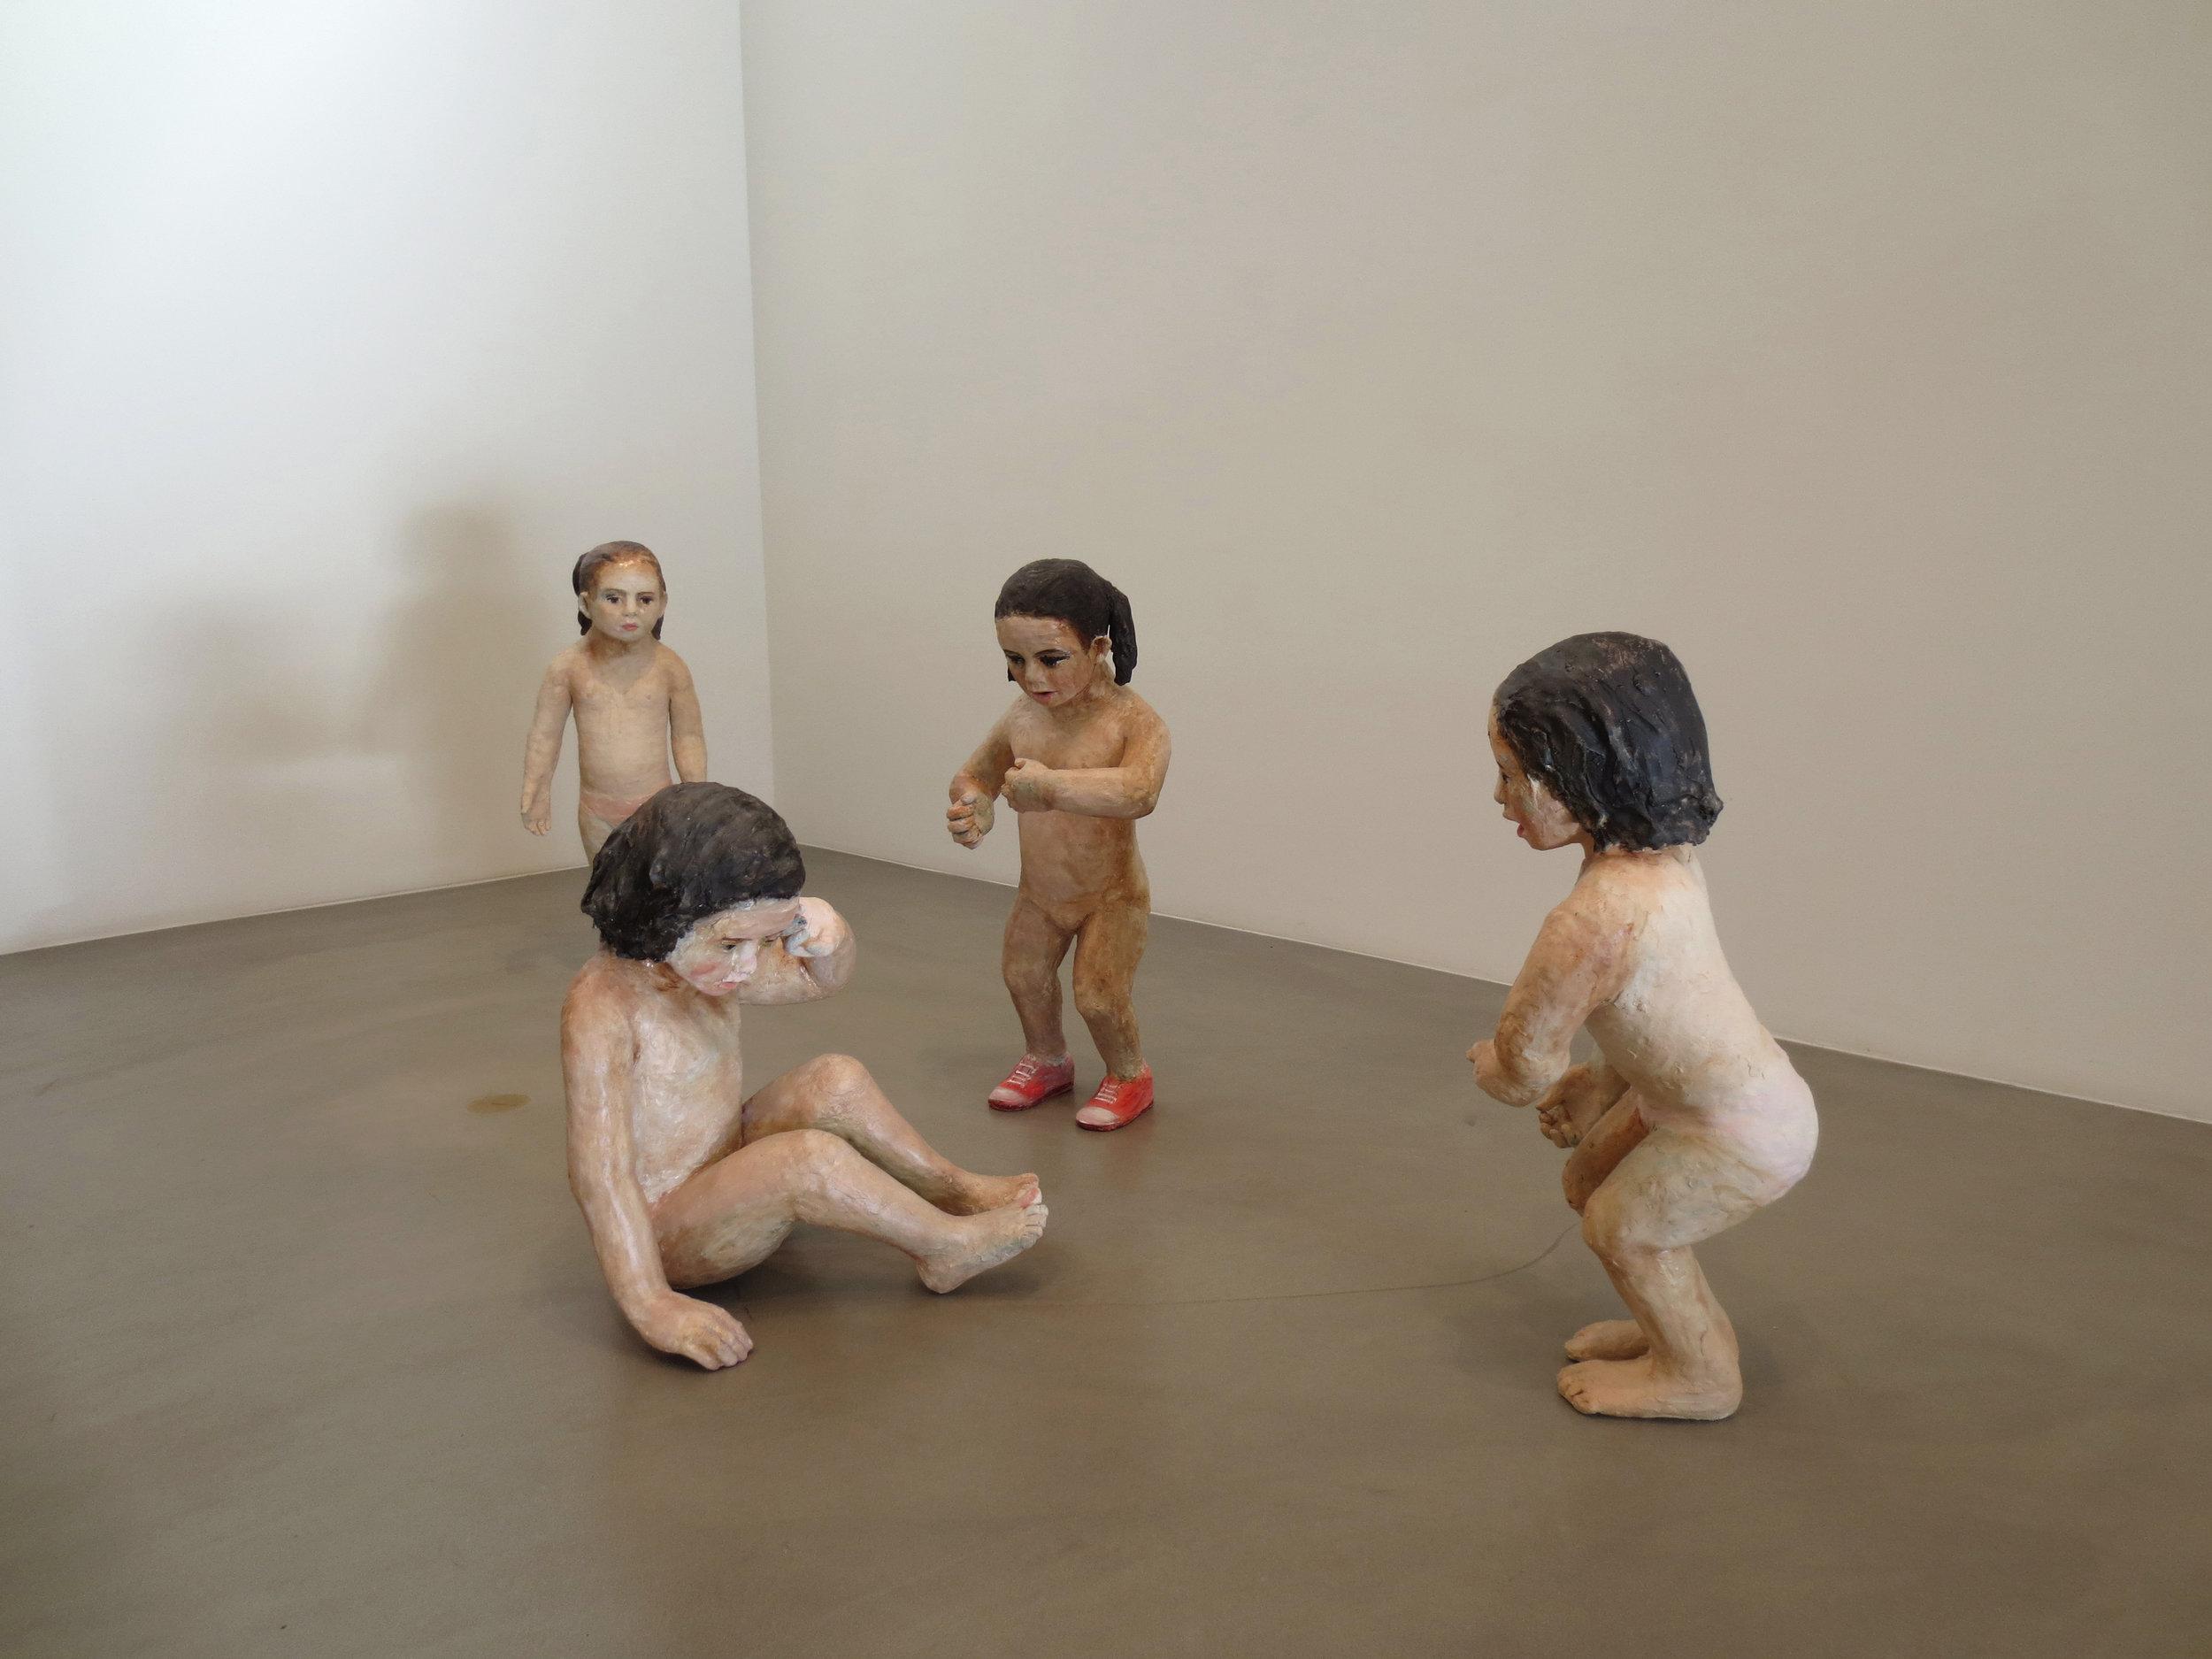 Pendencia, 2012, Glazed ceramic, Installation view, Scott White Contemporary Art, California